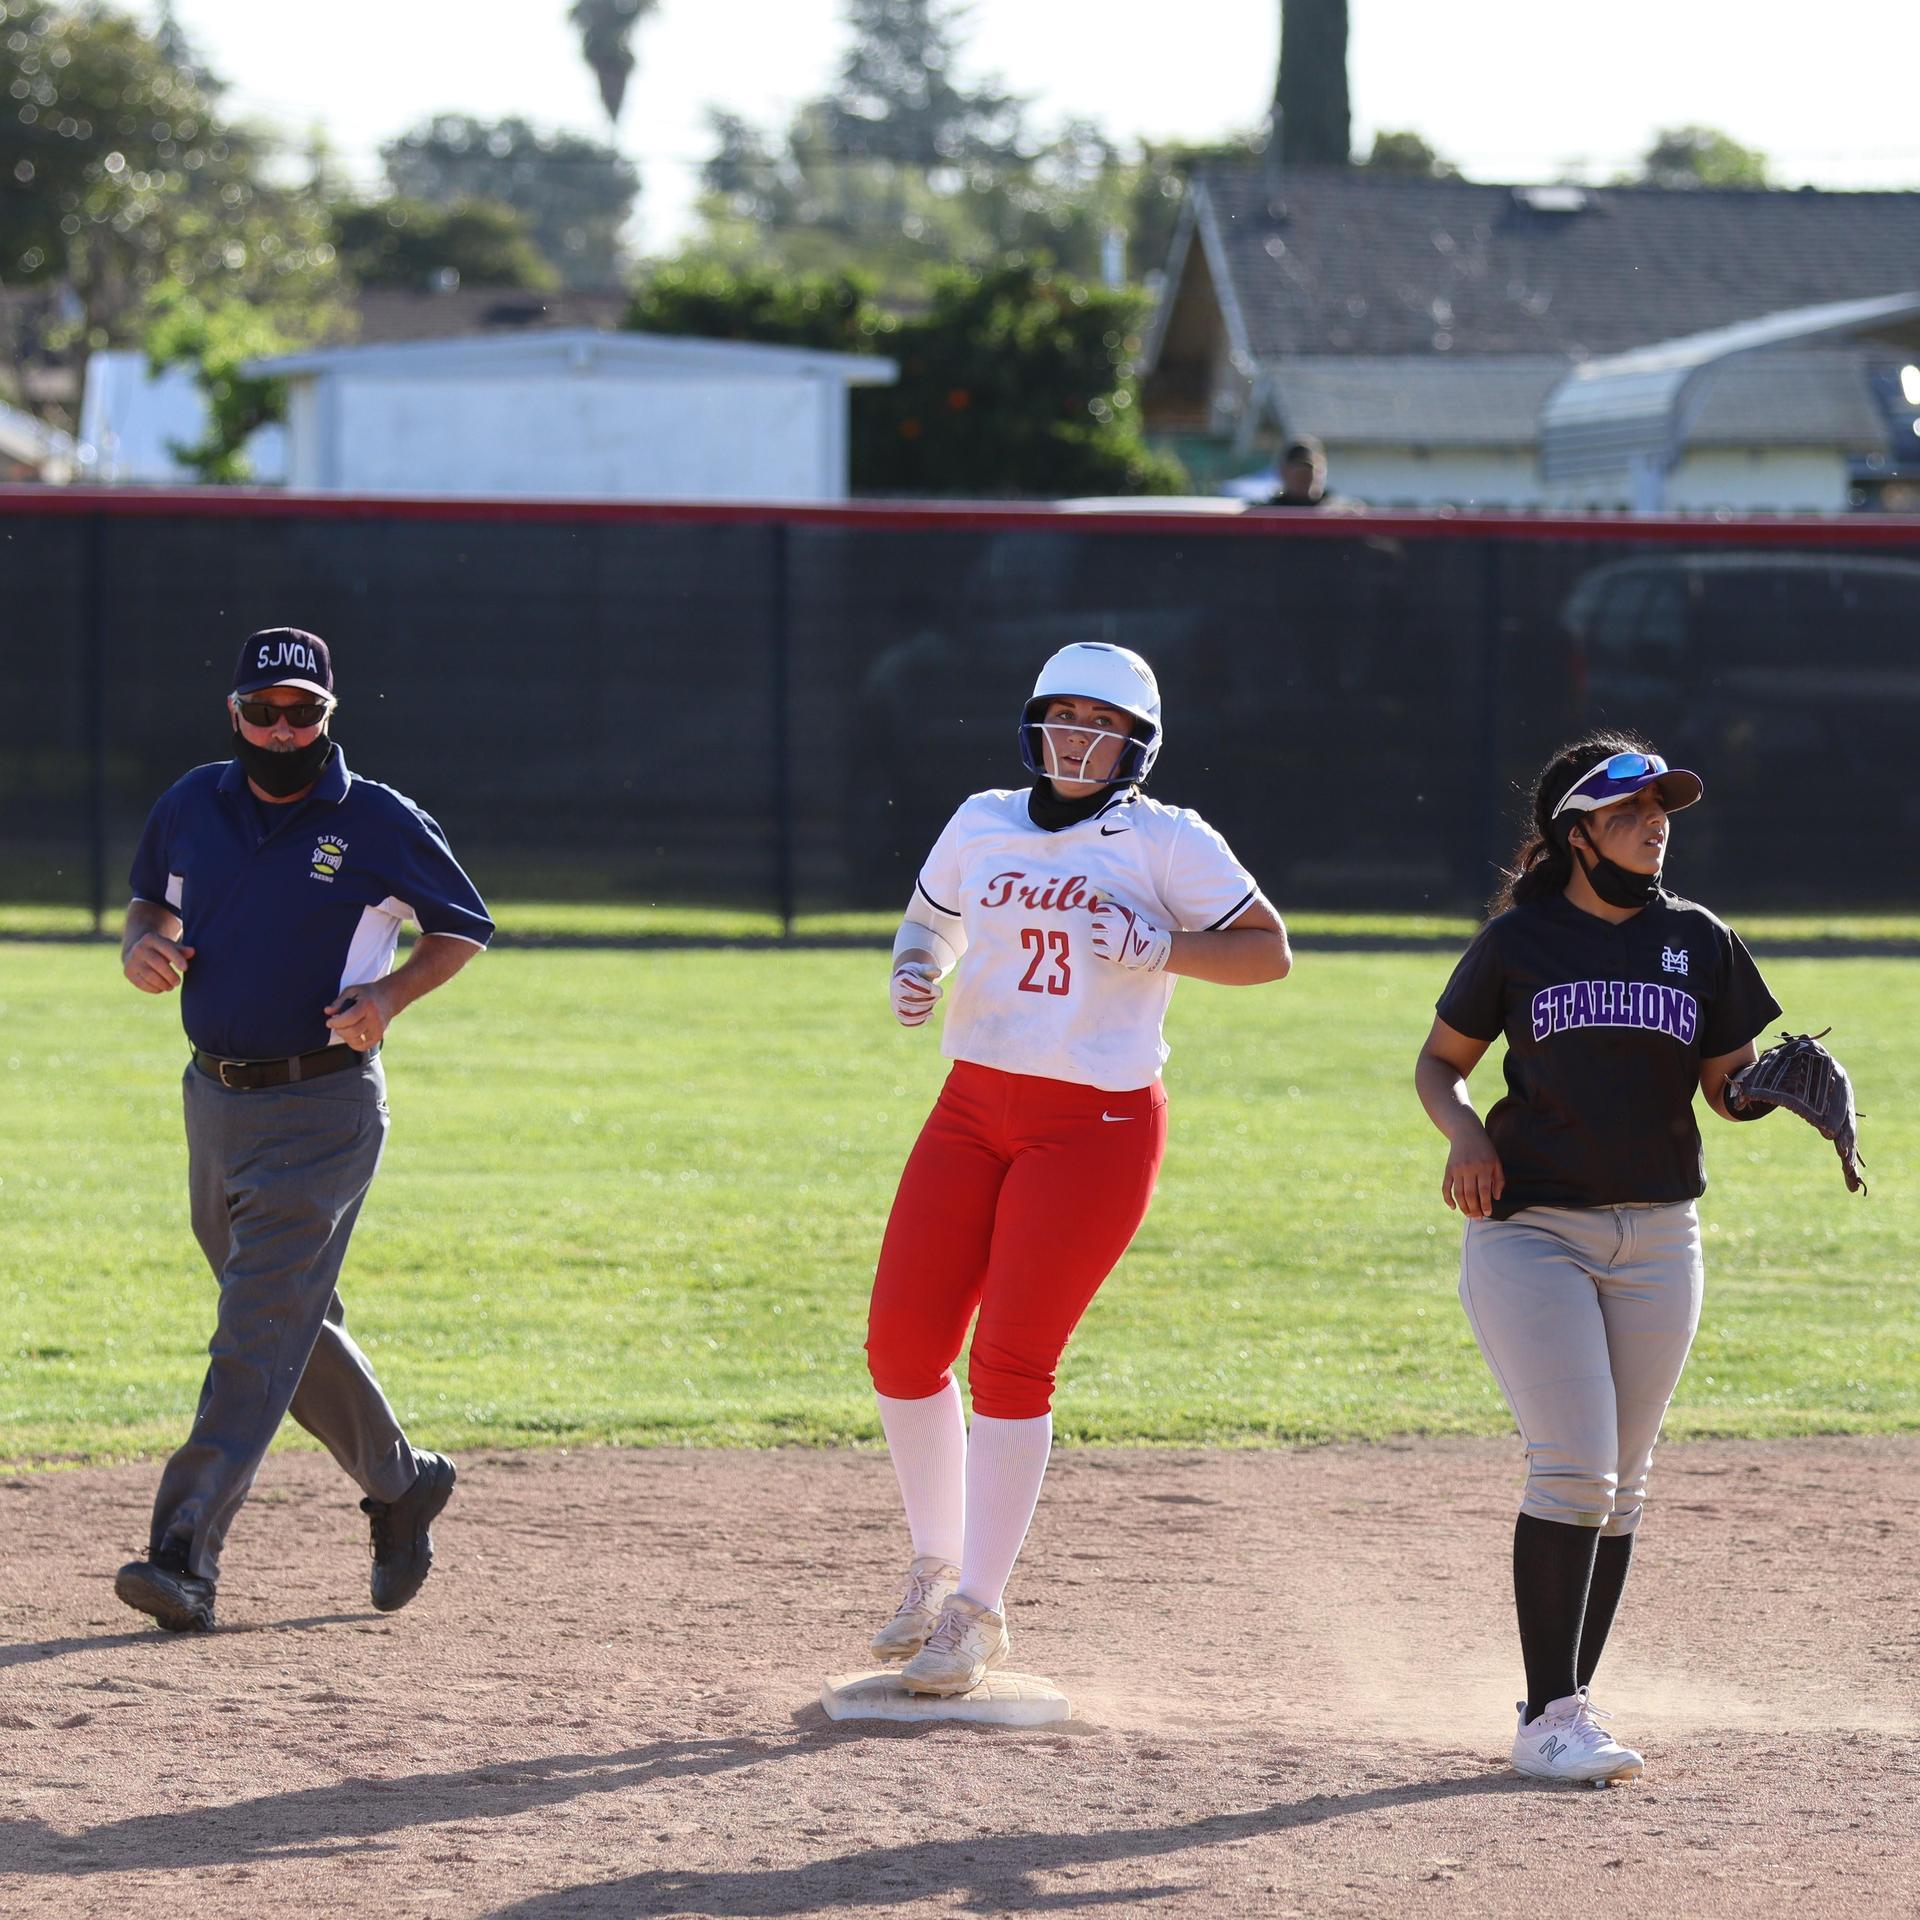 girls playing softball against Madera South